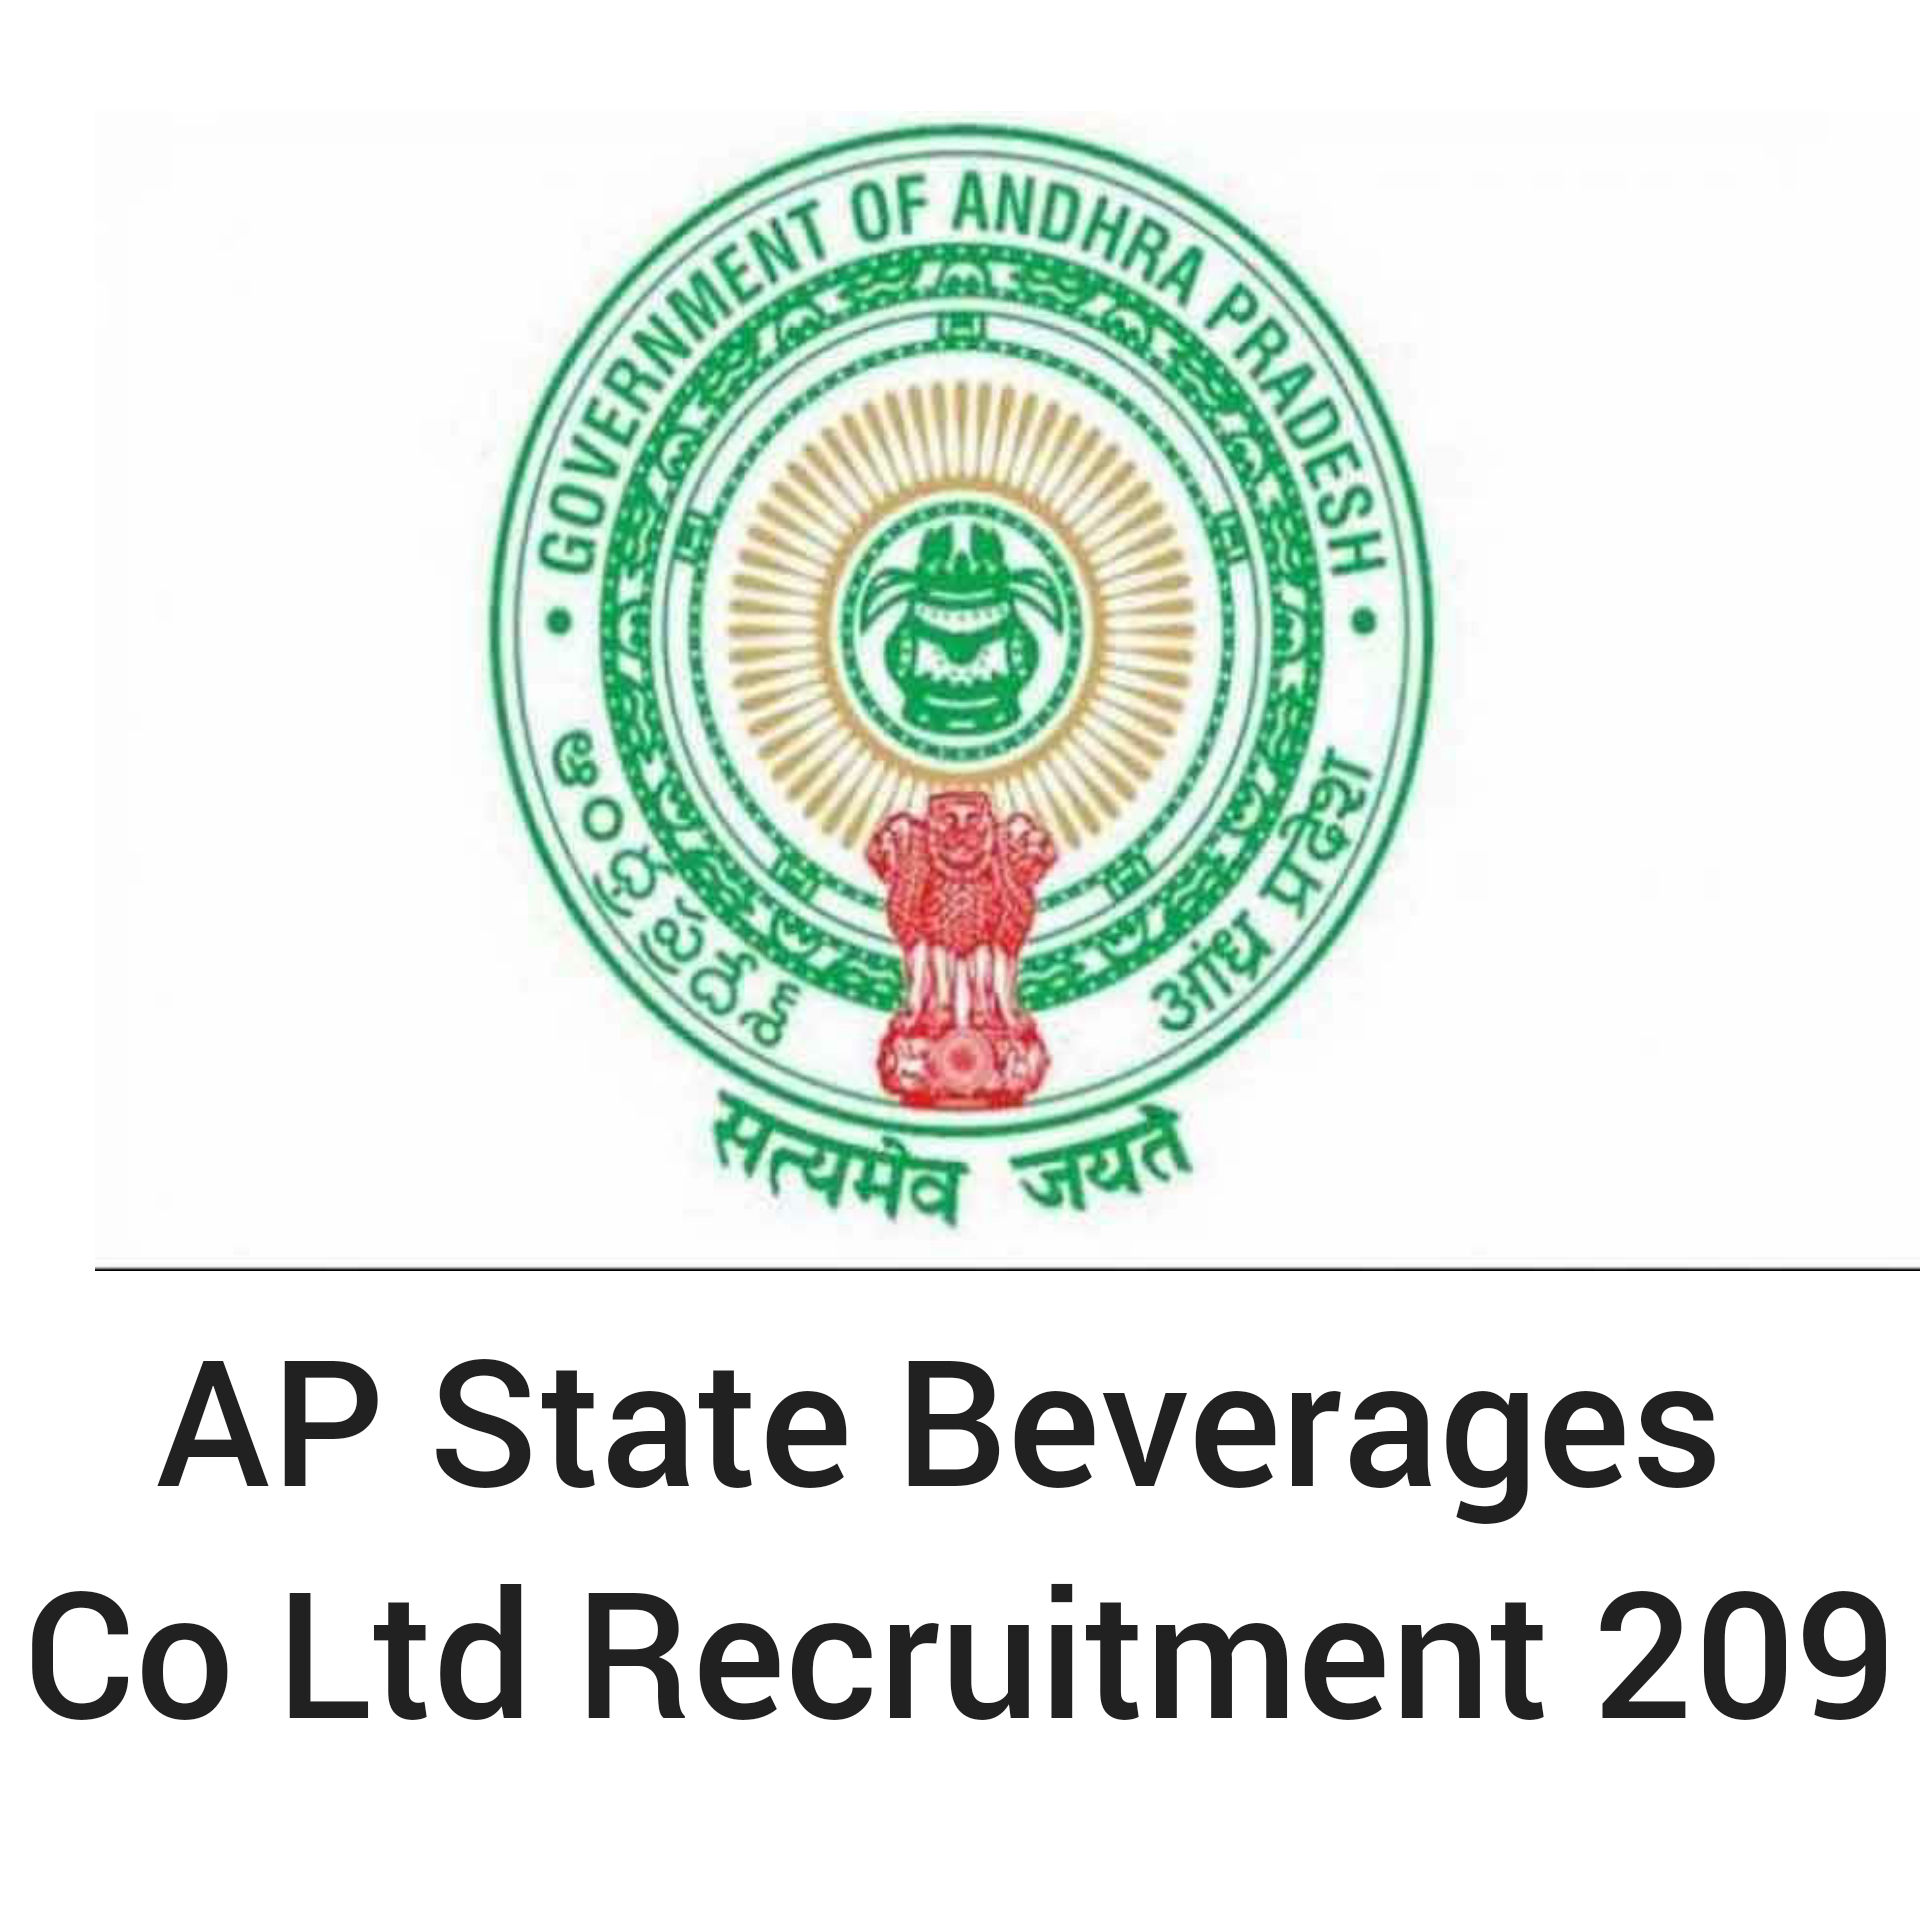 APSBCL Sales Supervisor Recruitment 2019 | Visakhapatnam | Chittoor | Guntur | Download Notification PDF